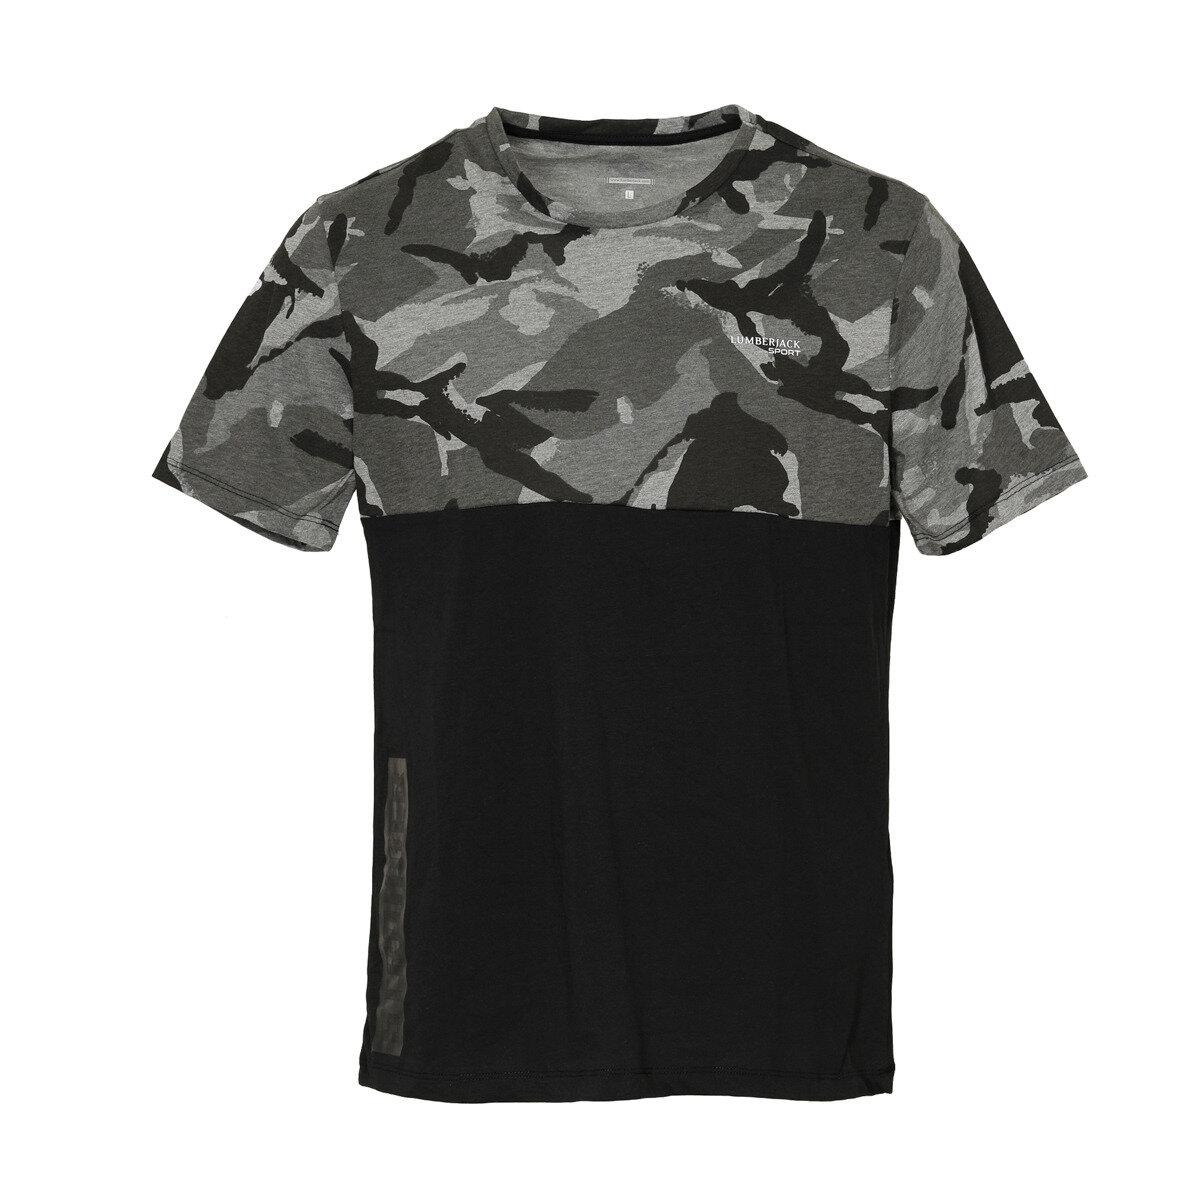 FLO M-18131 ALVİNA KK TSHIRT Black Male T-Shirt LUMBERJACK